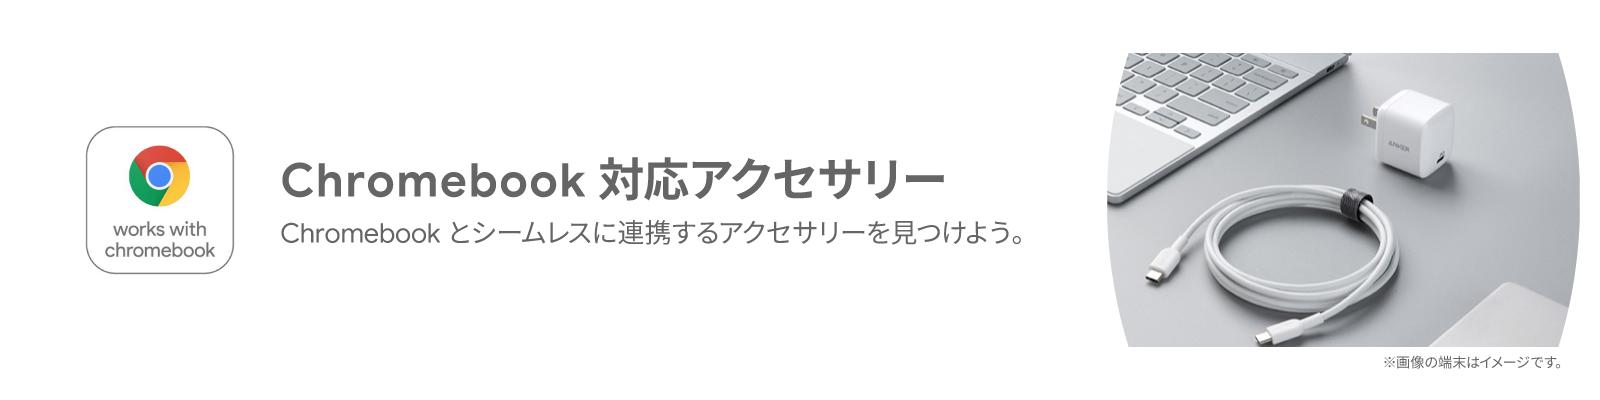 """ Chromebook (クロームブック) 対応アクセサリー  Chromebook (クロームブック) とシームレスに 連携するアクセサリーを見つけよう。 """